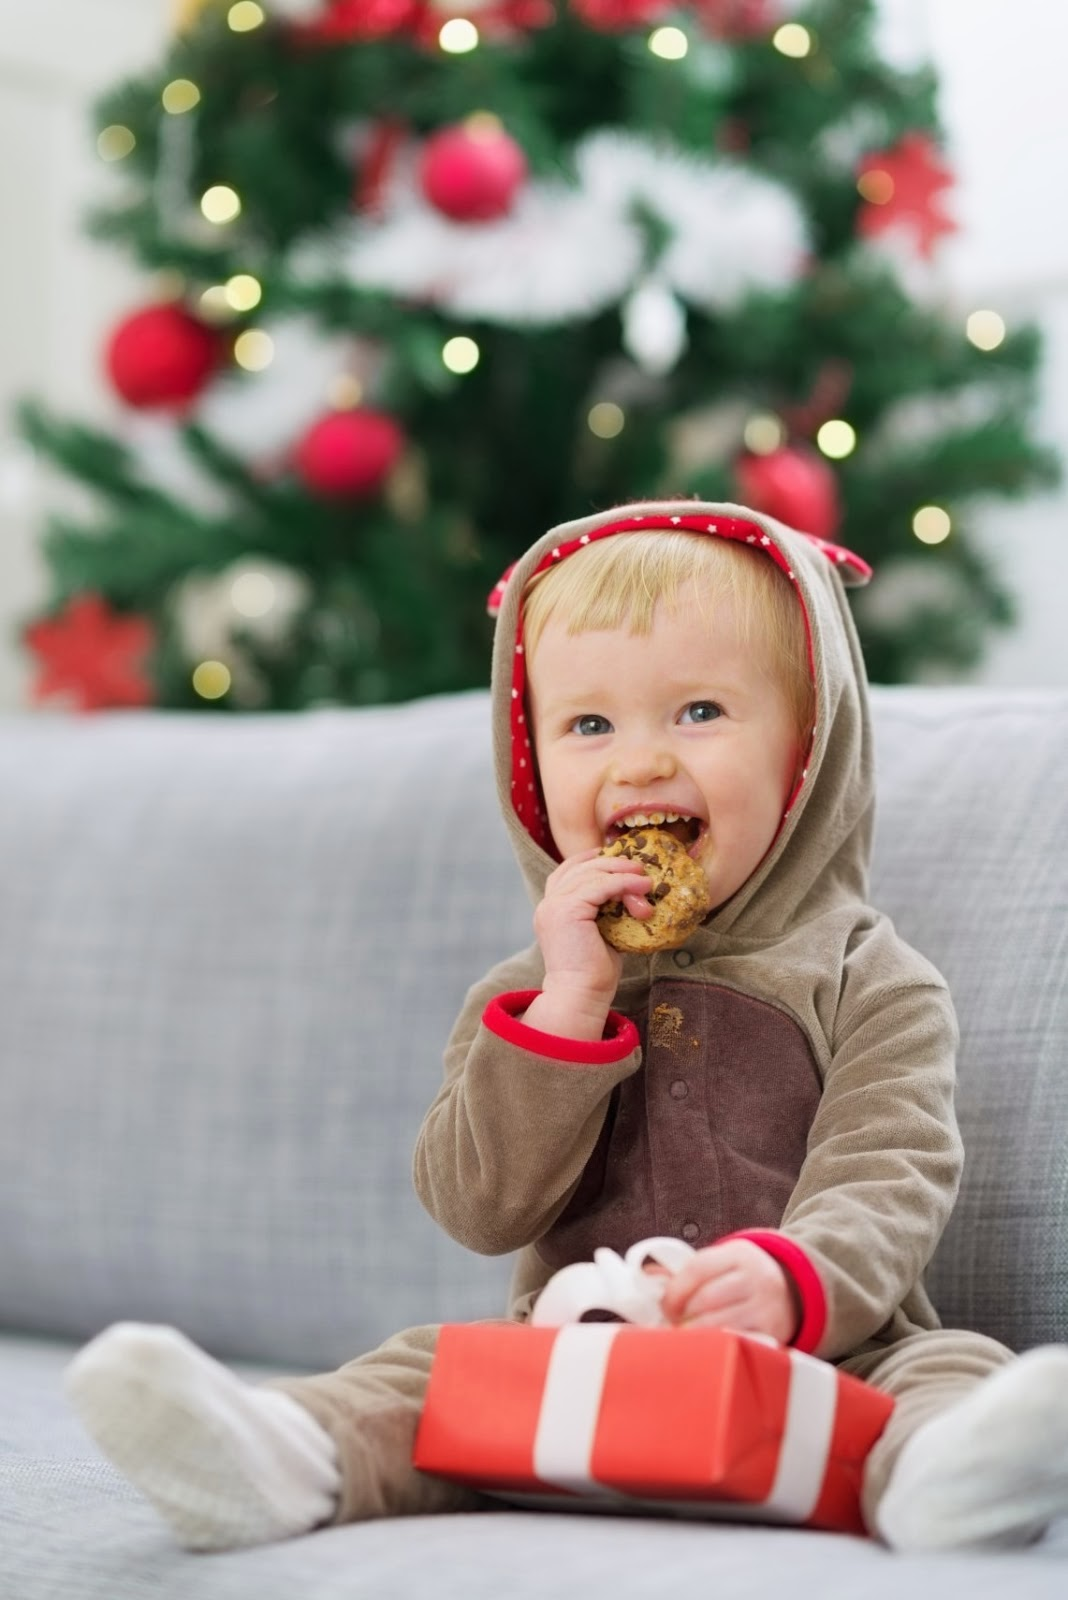 ♥ ♫ ♥ So Happy Baby Christmas ♥ ♫ ♥